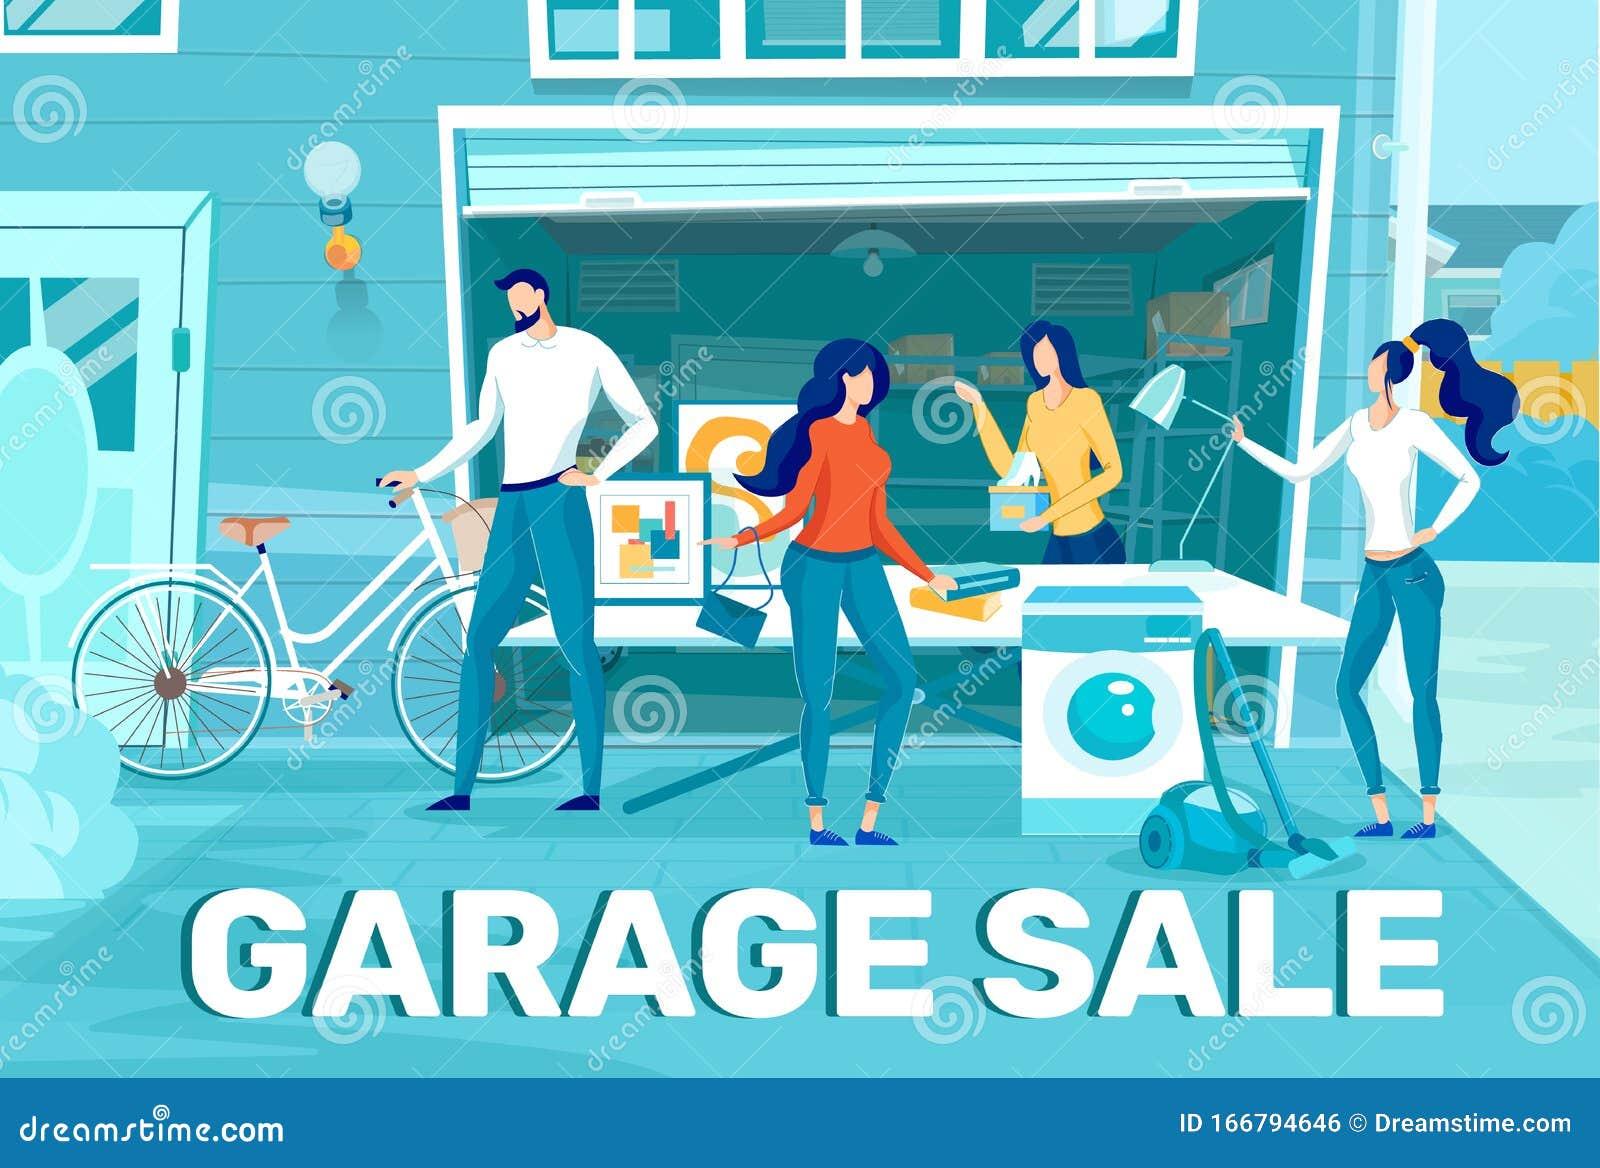 Home Stuff Garage Sale Flat Vector Promo Banner Stock Vector Illustration Of Male Illustration 166794646